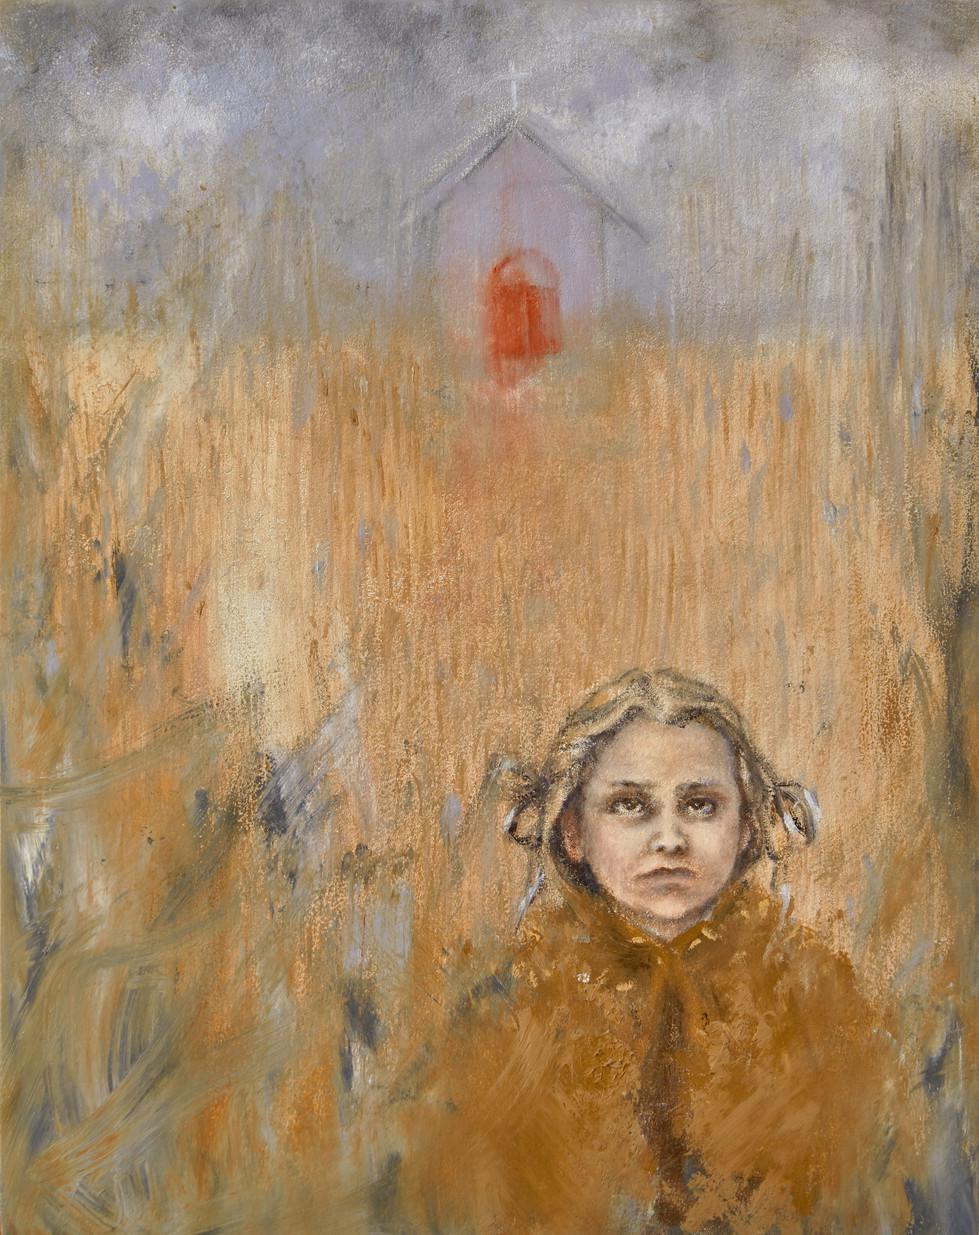 Wheat.psd.jpg